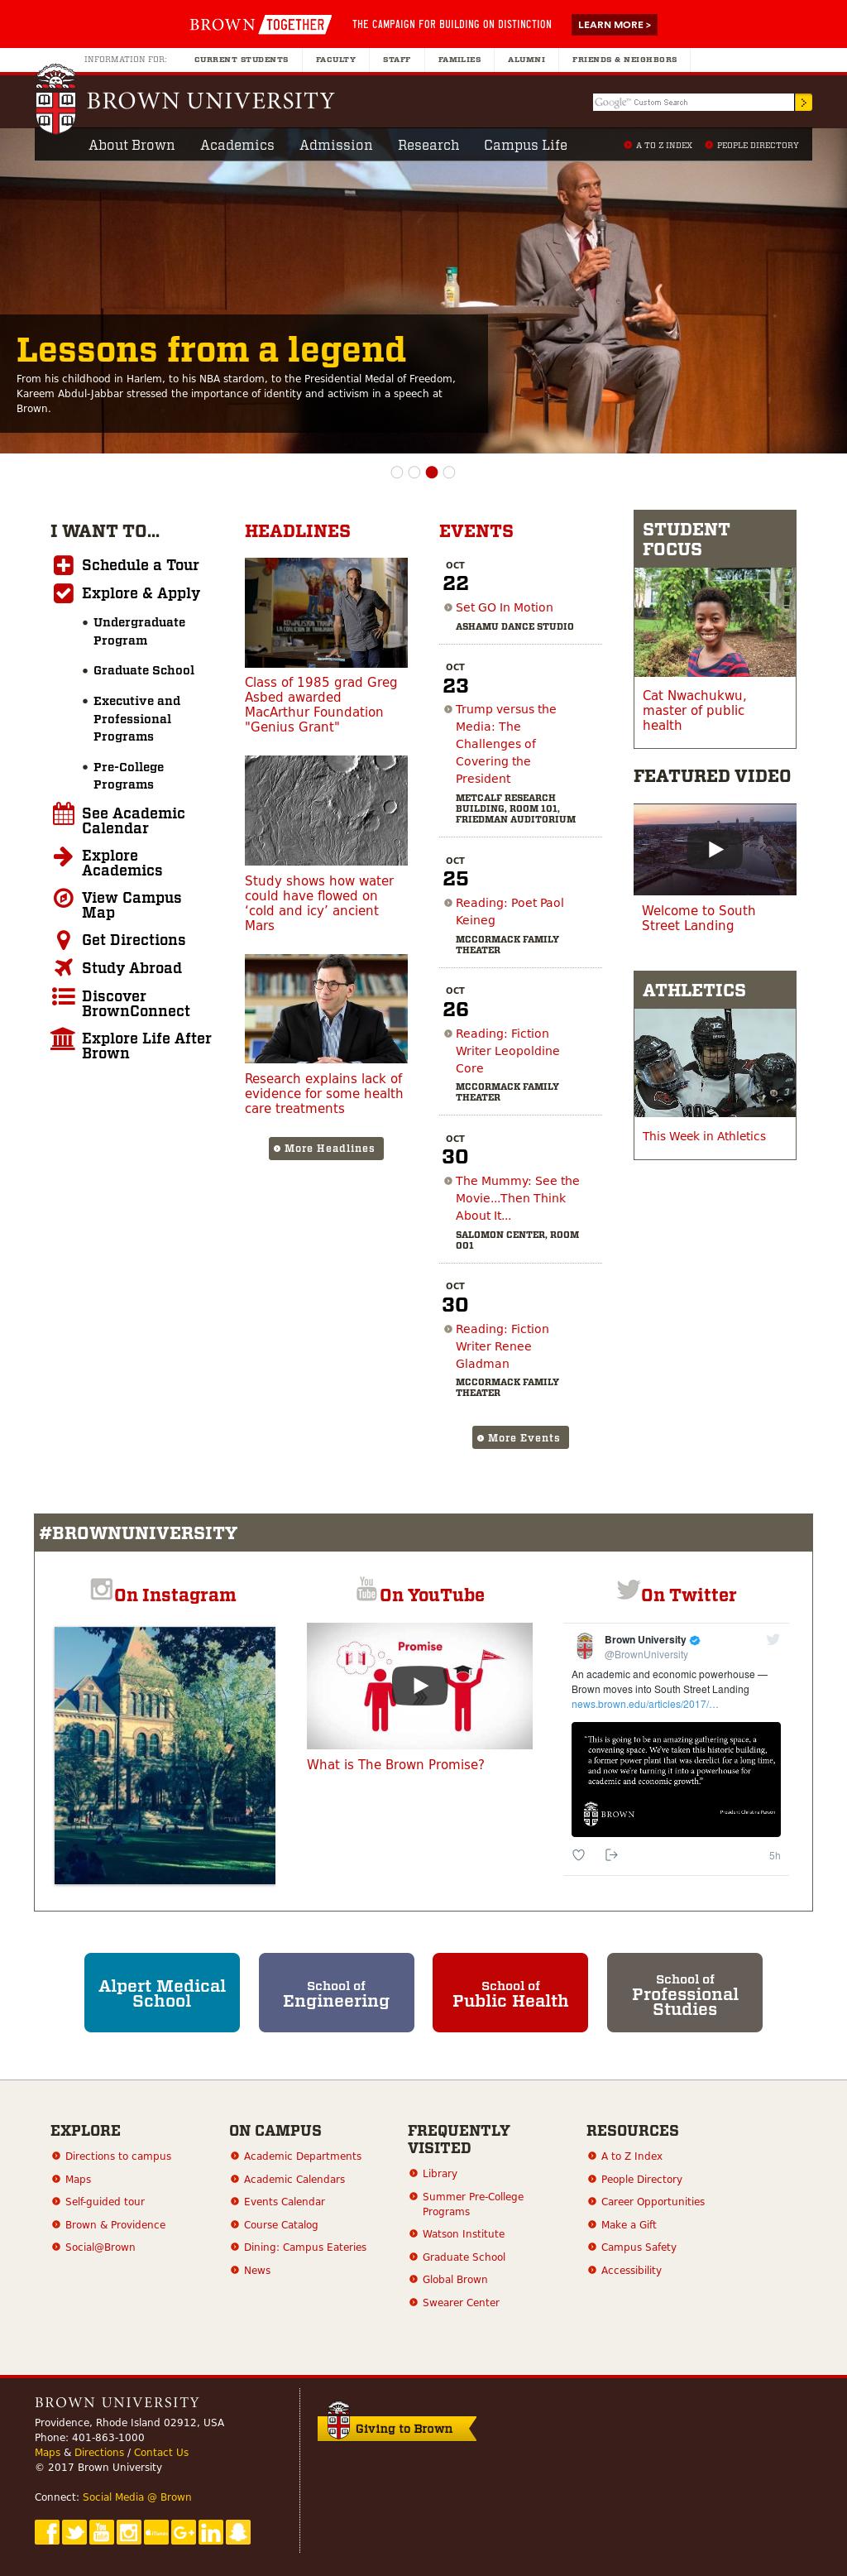 Brown university dating website